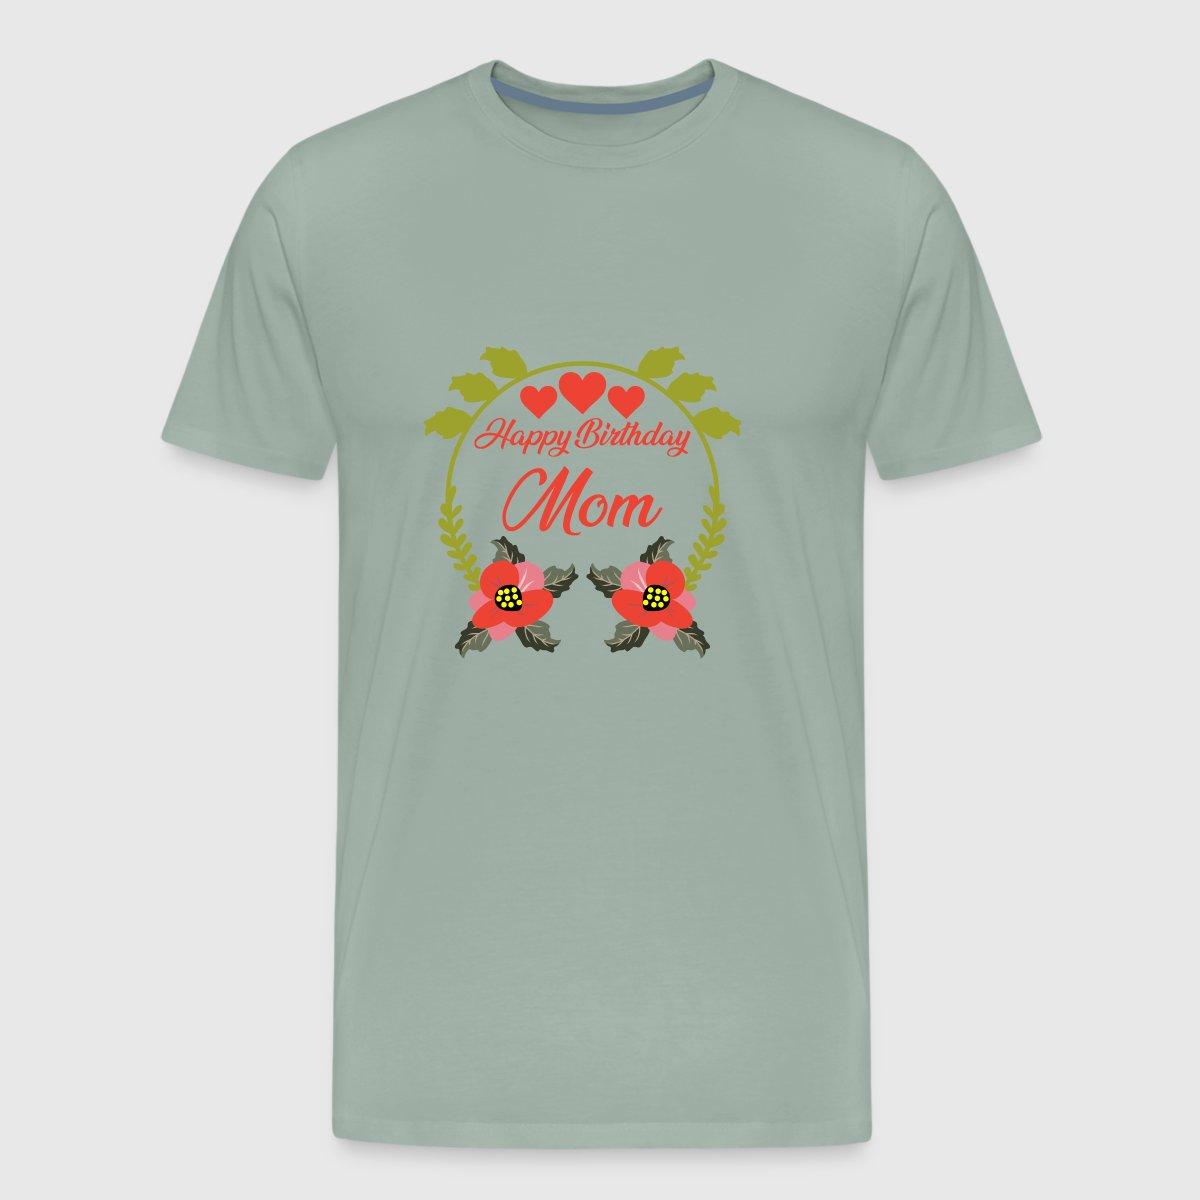 Birthday T Shirts For Mom